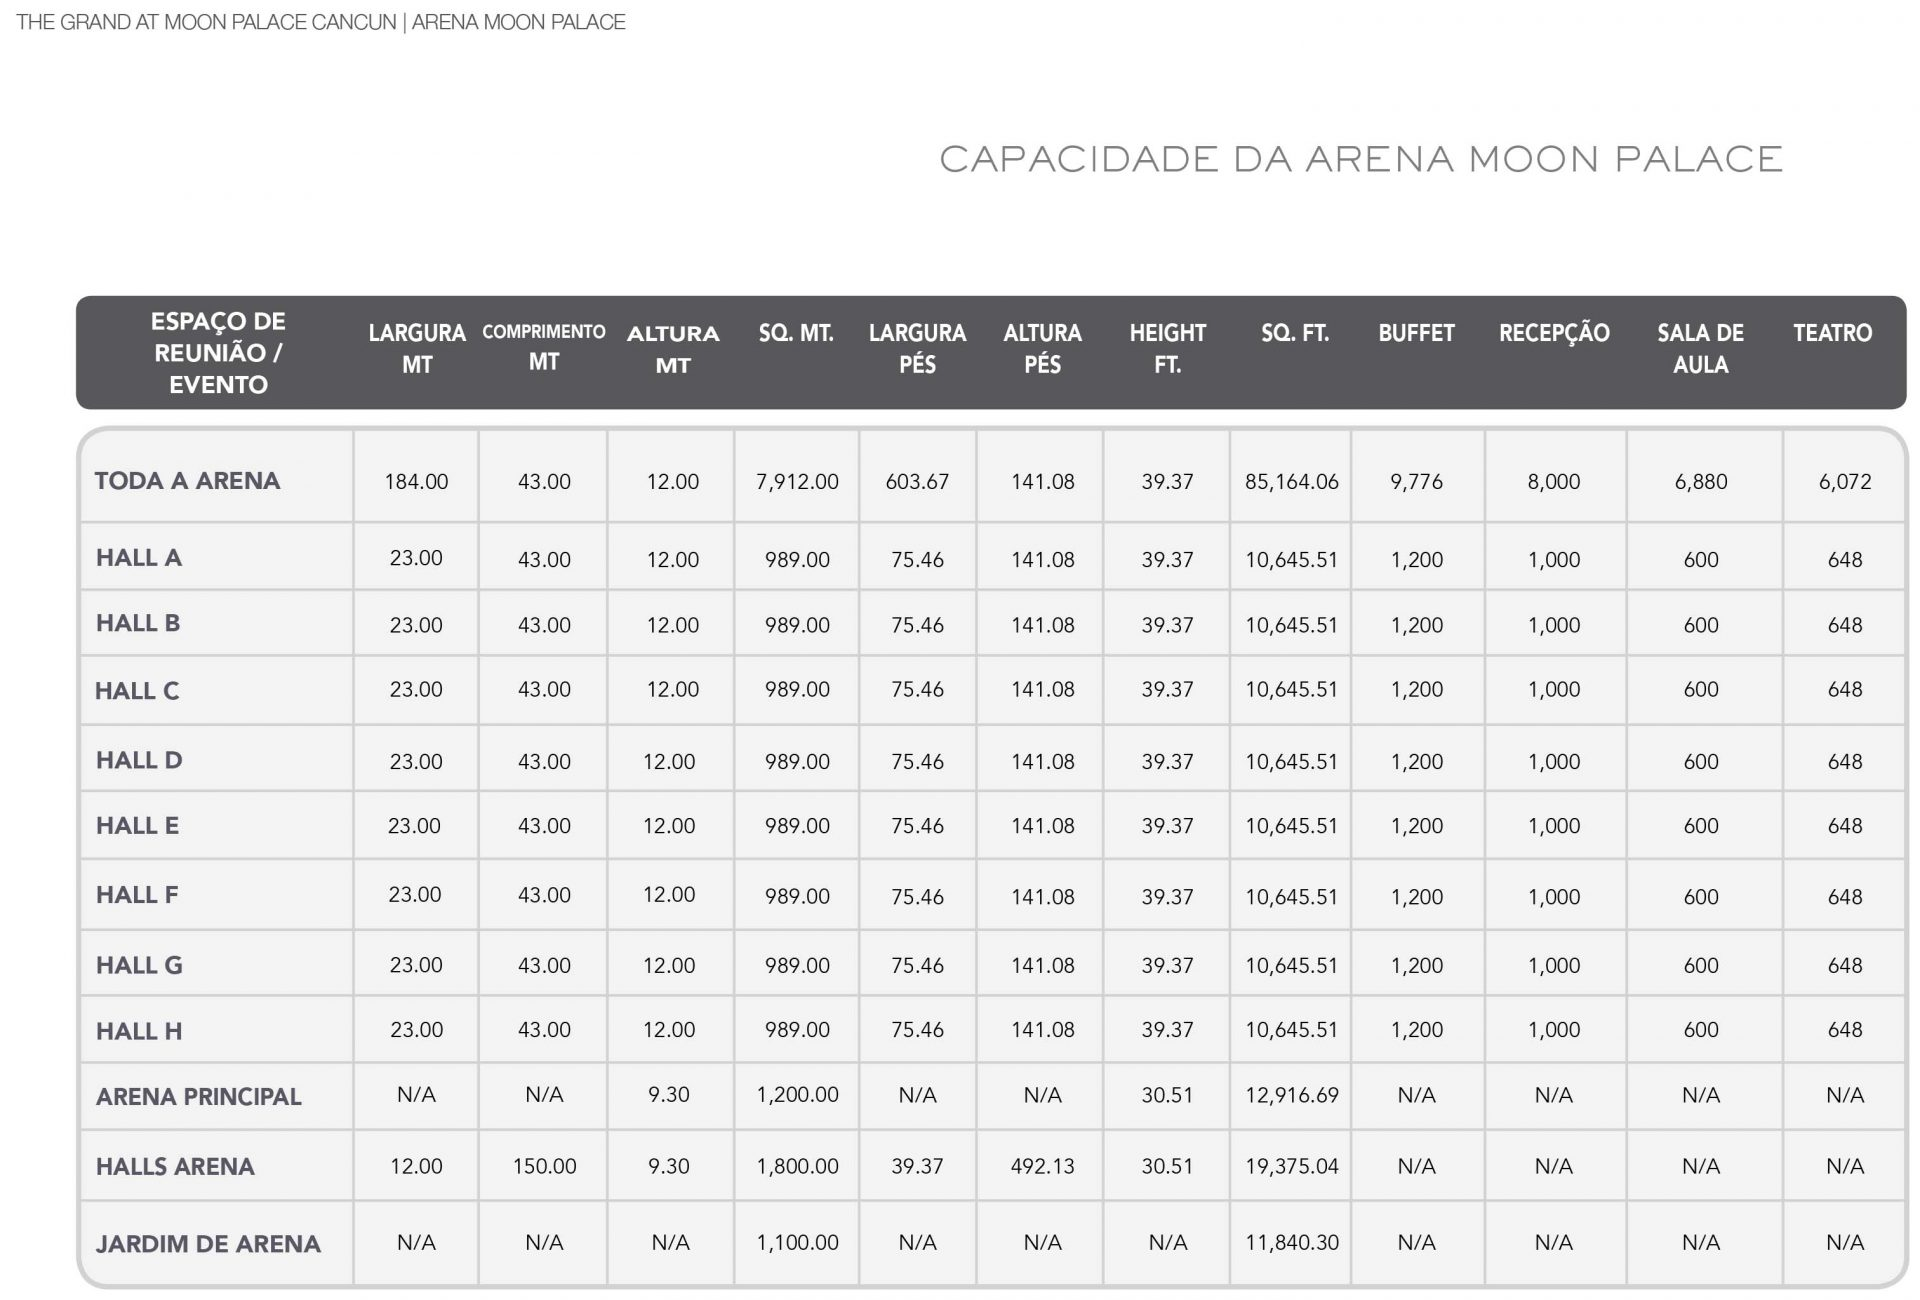 Capacidade da Arena Moon Palace